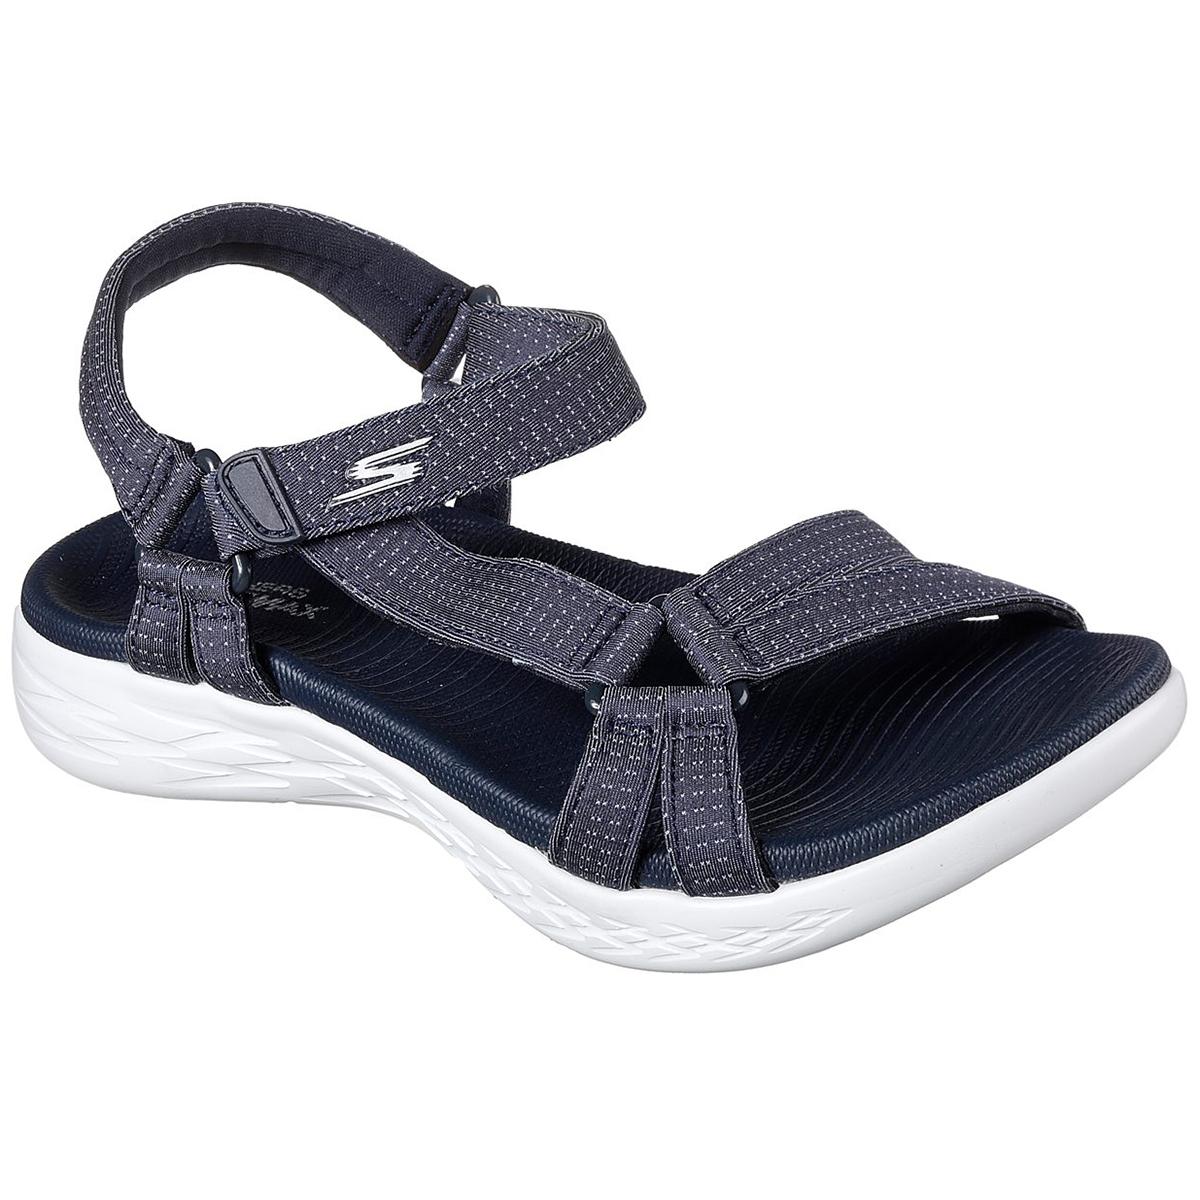 Skechers Women's On The Go 600 -  Brilliancy Sandals - Blue, 8